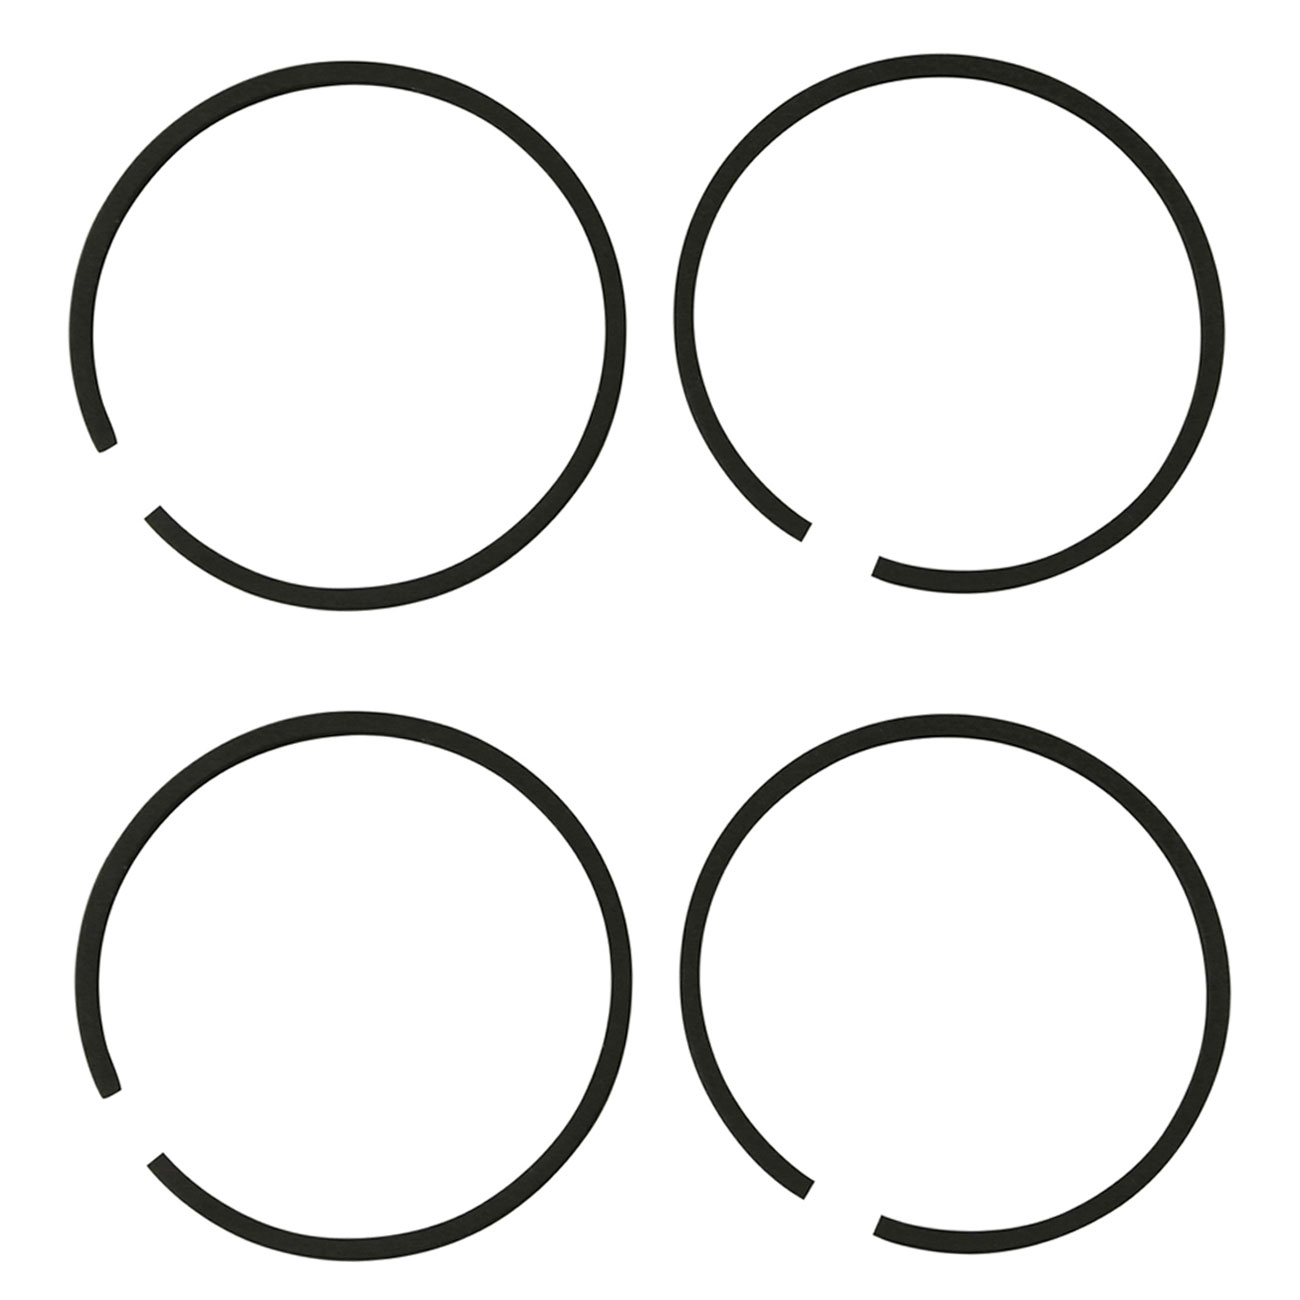 Set Of 4 Piston Rings For Husqvarna Chainsaw 36 136 137 (38mm)